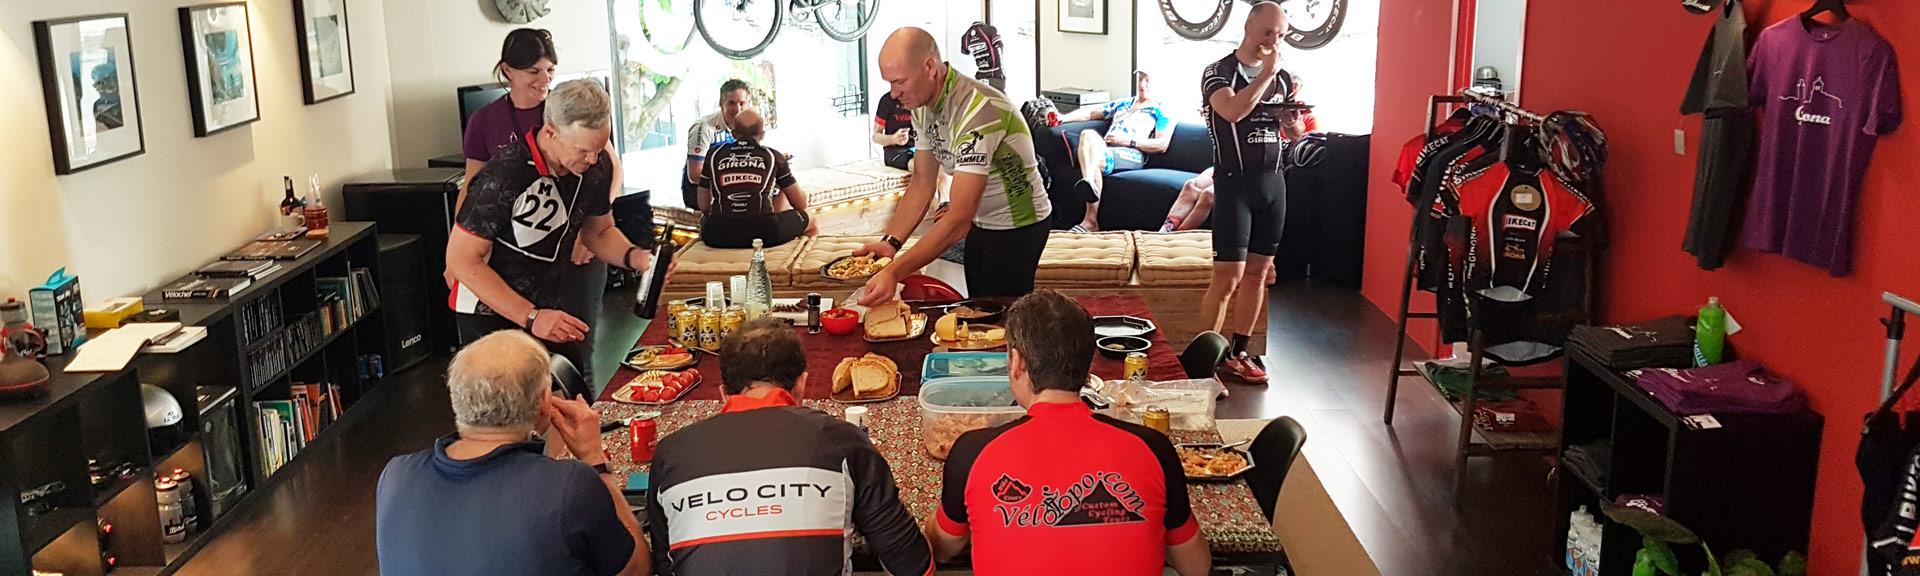 Bikecat Botiga Ciclista - Private events